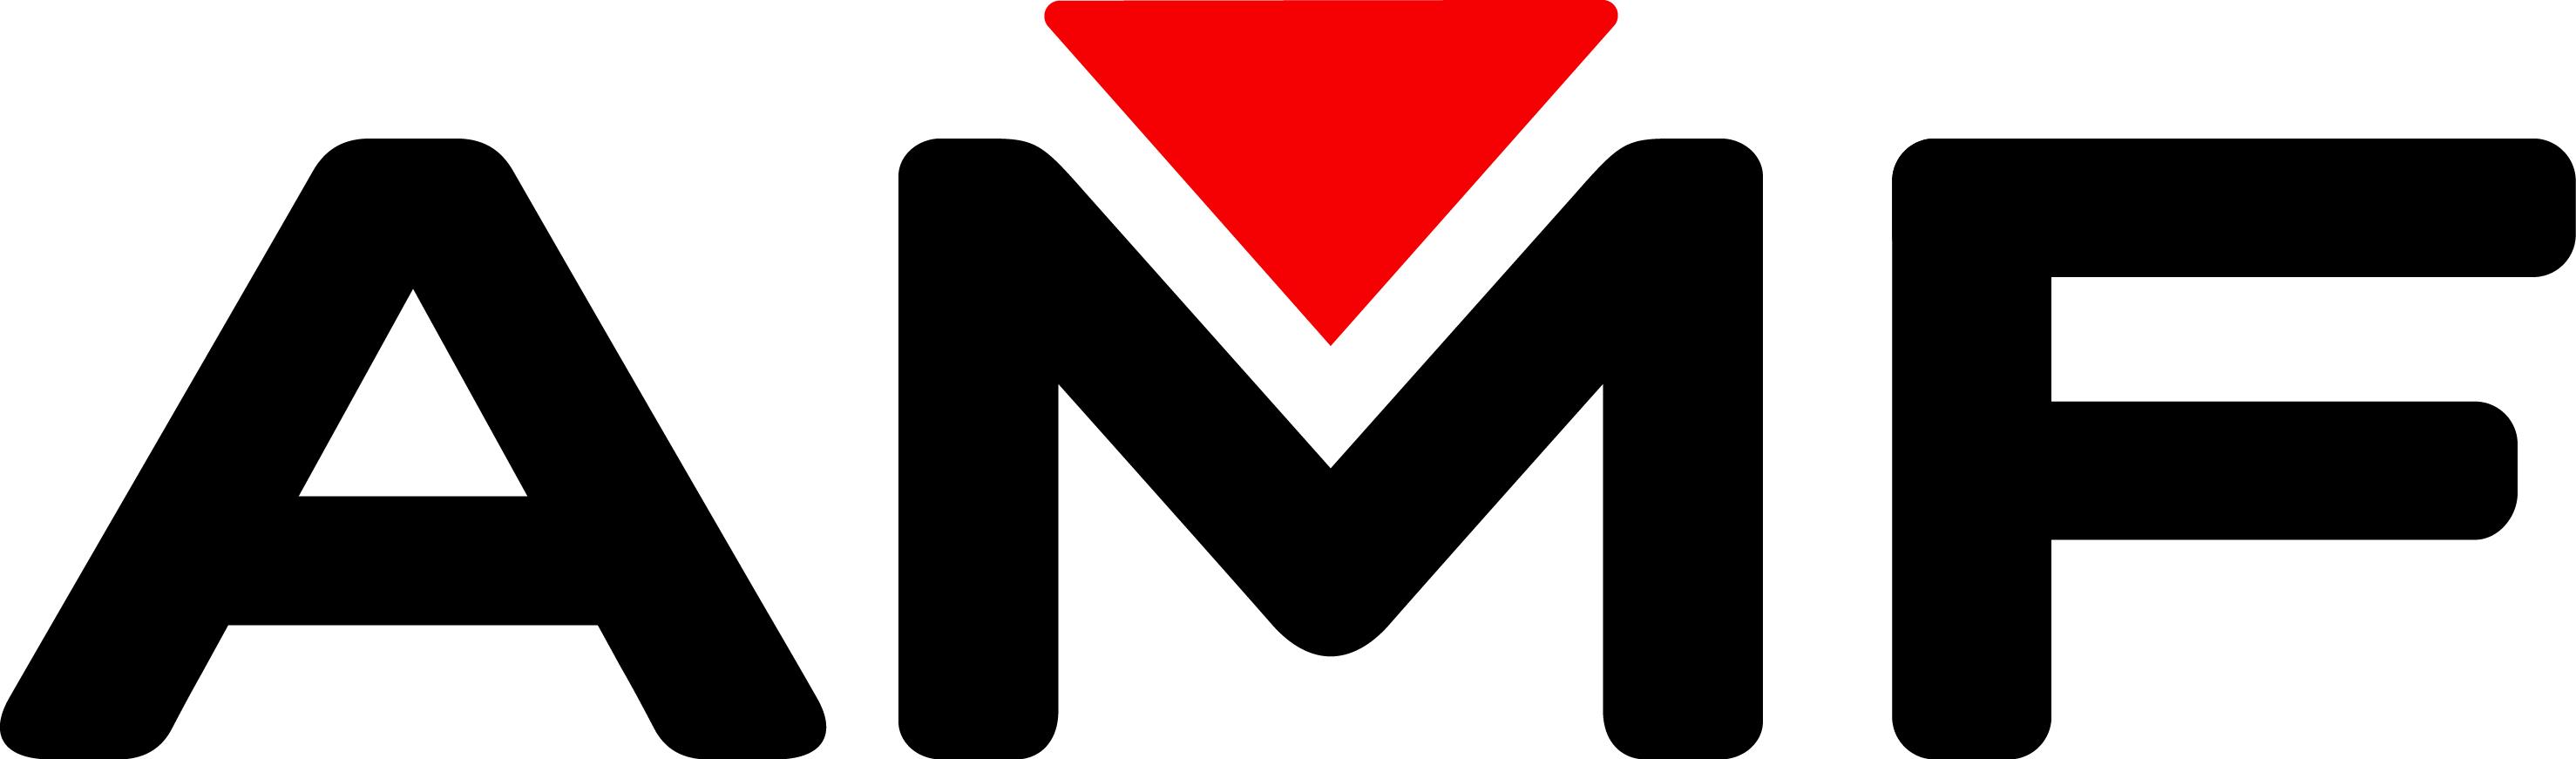 Filename: AMF-LOGO-Black-red.jpg - Amf Bowling Logo PNG